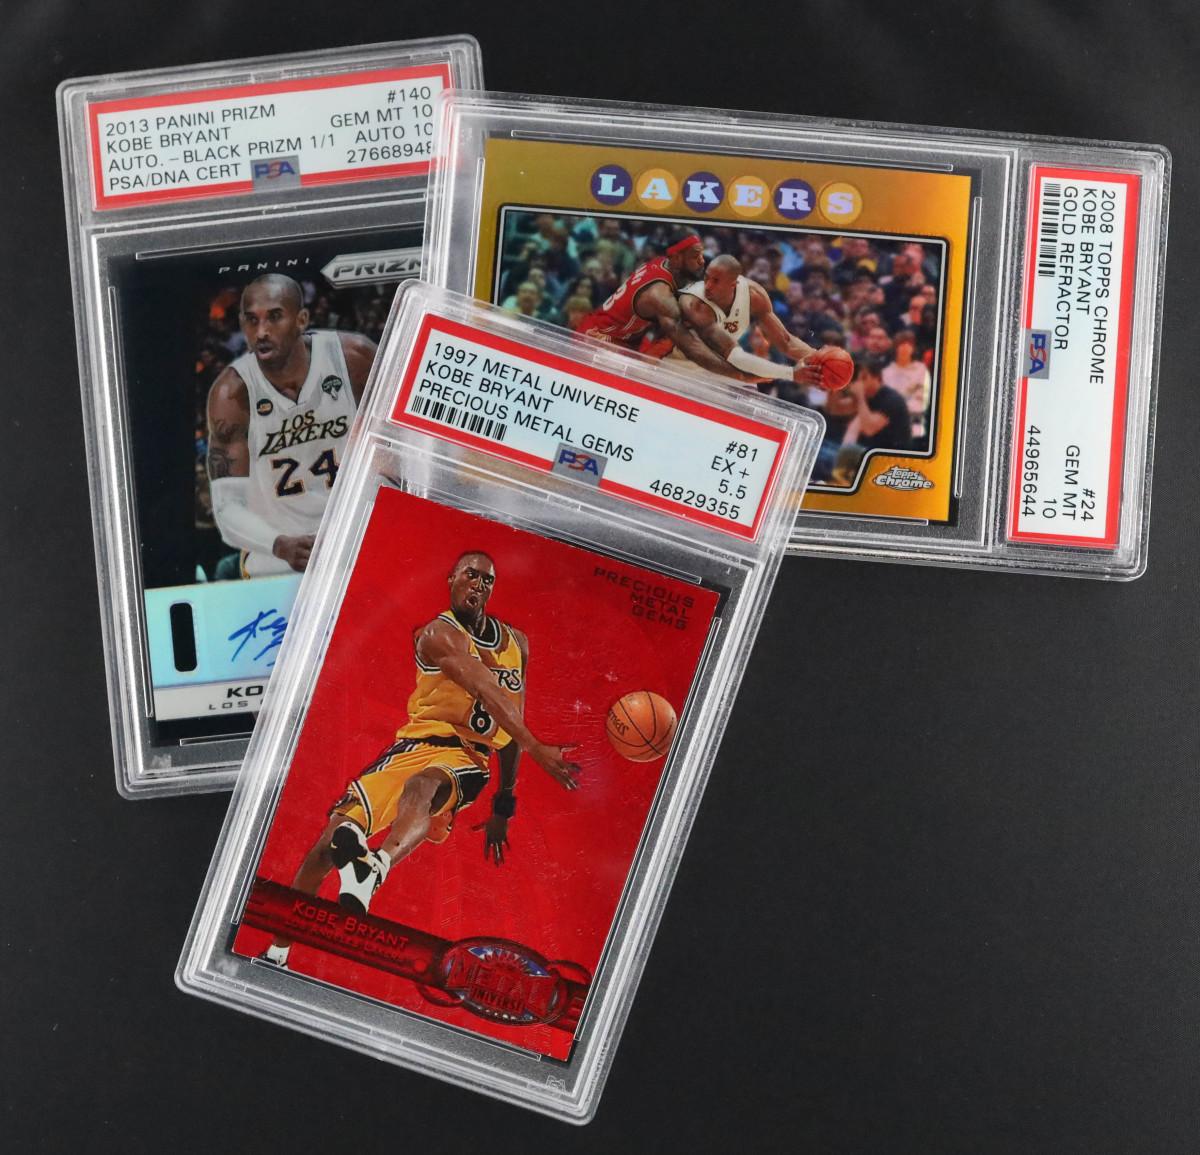 Leore Avidar's collection of Kobe Bryant cards.